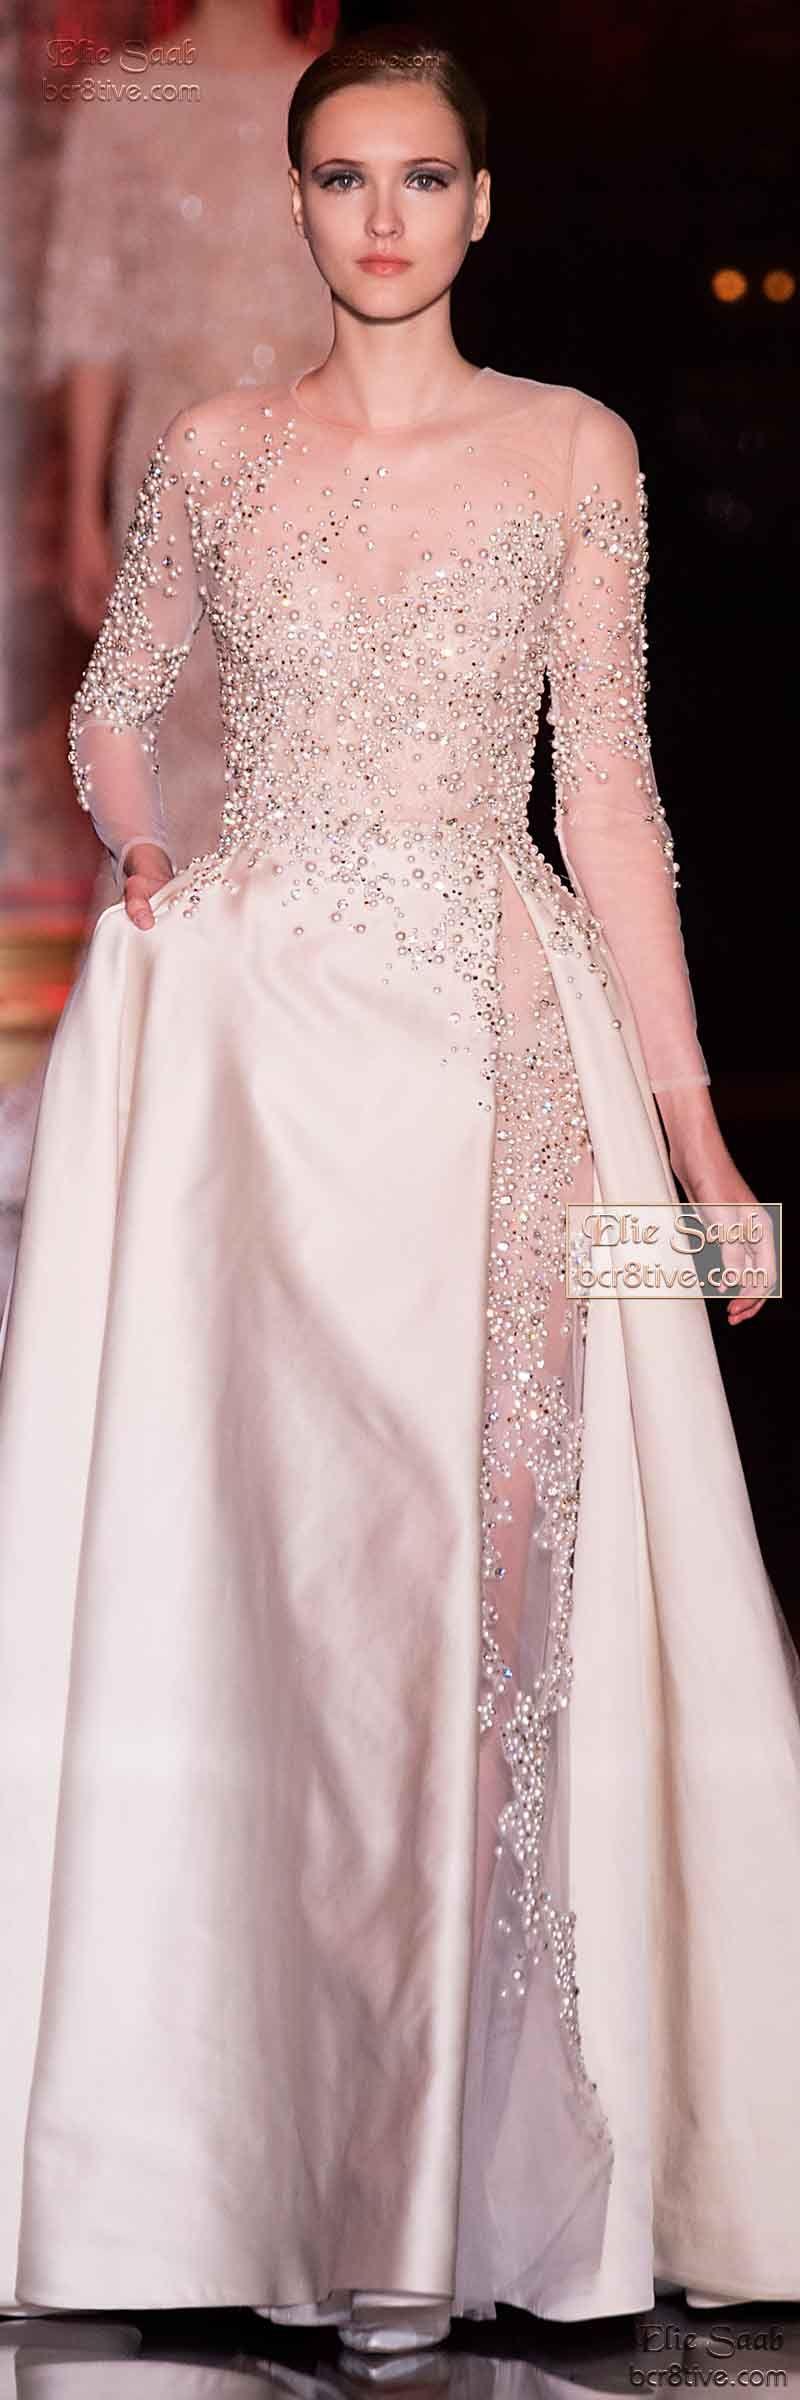 Elie Saab Fall Winter 2014-15 Couture   Abendkleider ...